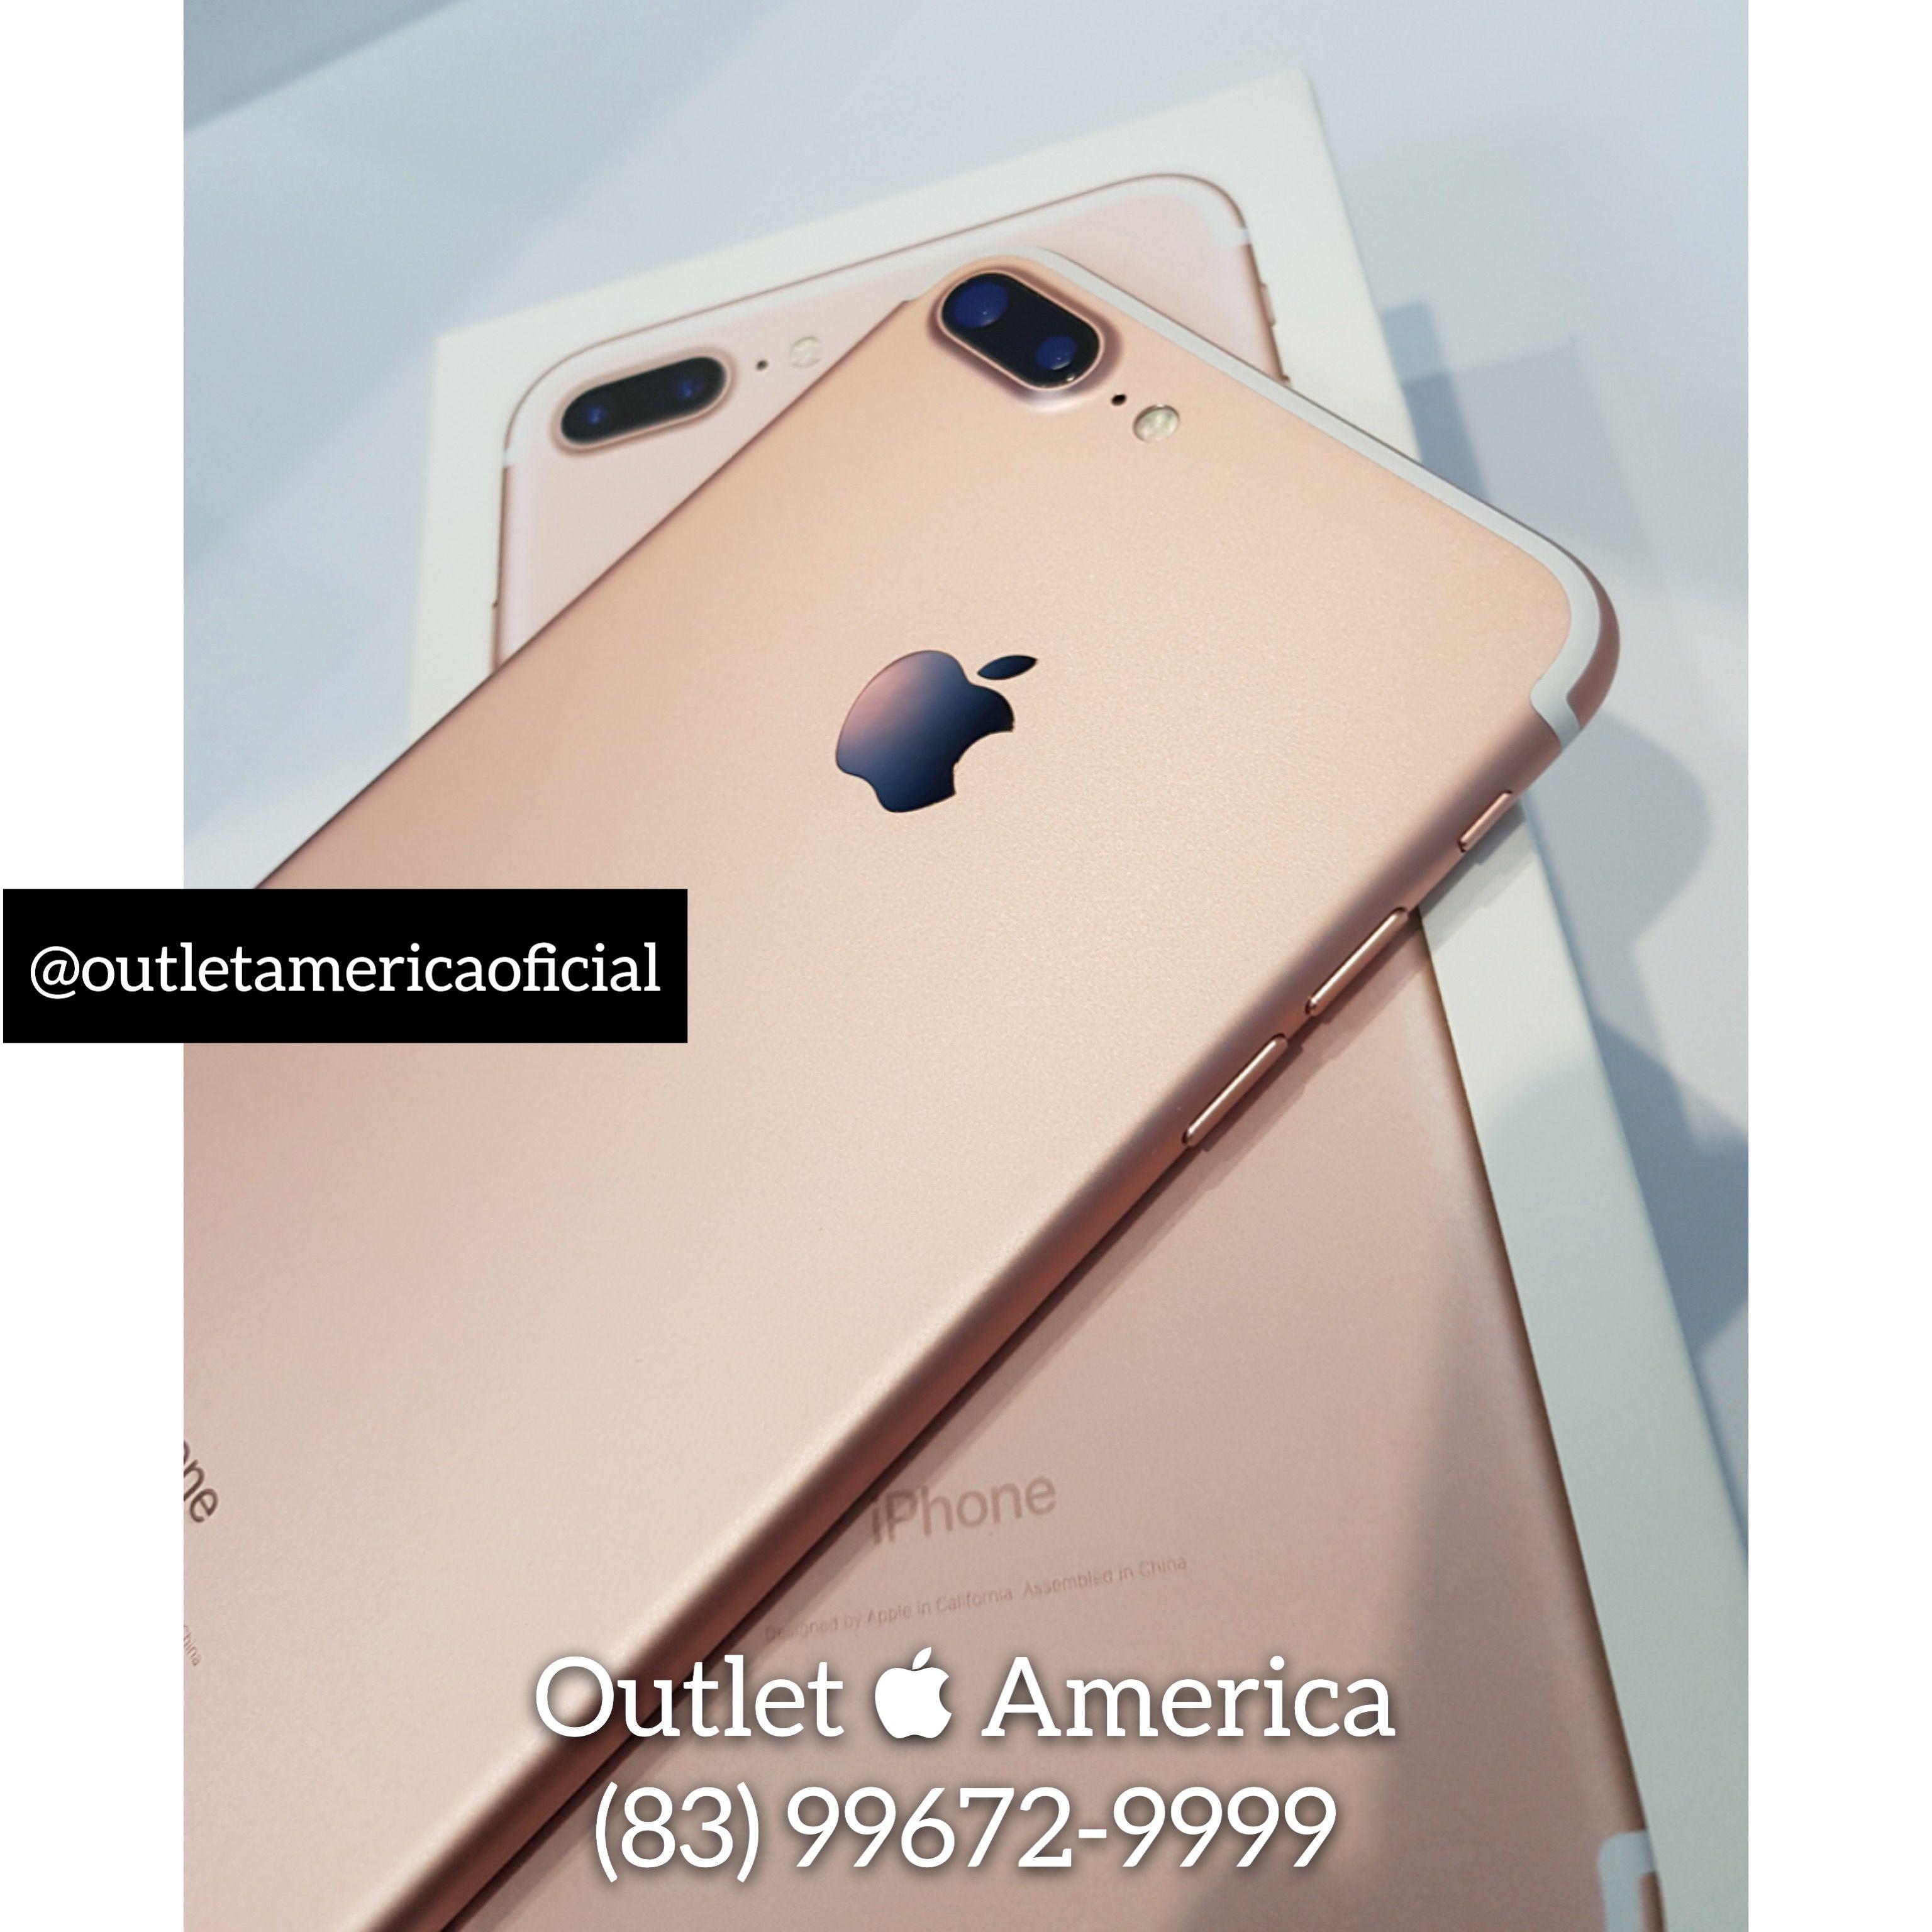 iPhone 7 Plus Rose Menor pre§o do BRASIL Instagram outletamericaoficial